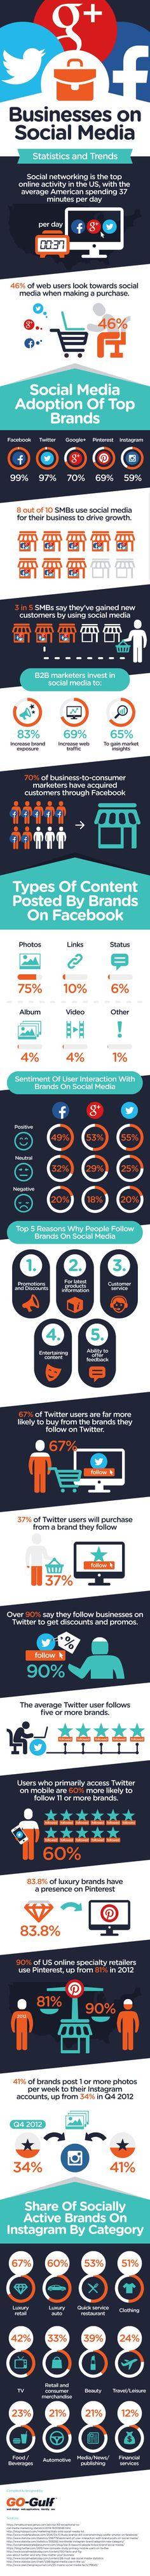 Businesses on socialmedia http://www.smartseoservice.com/convert-web-traffic-into-sales-or-leads/